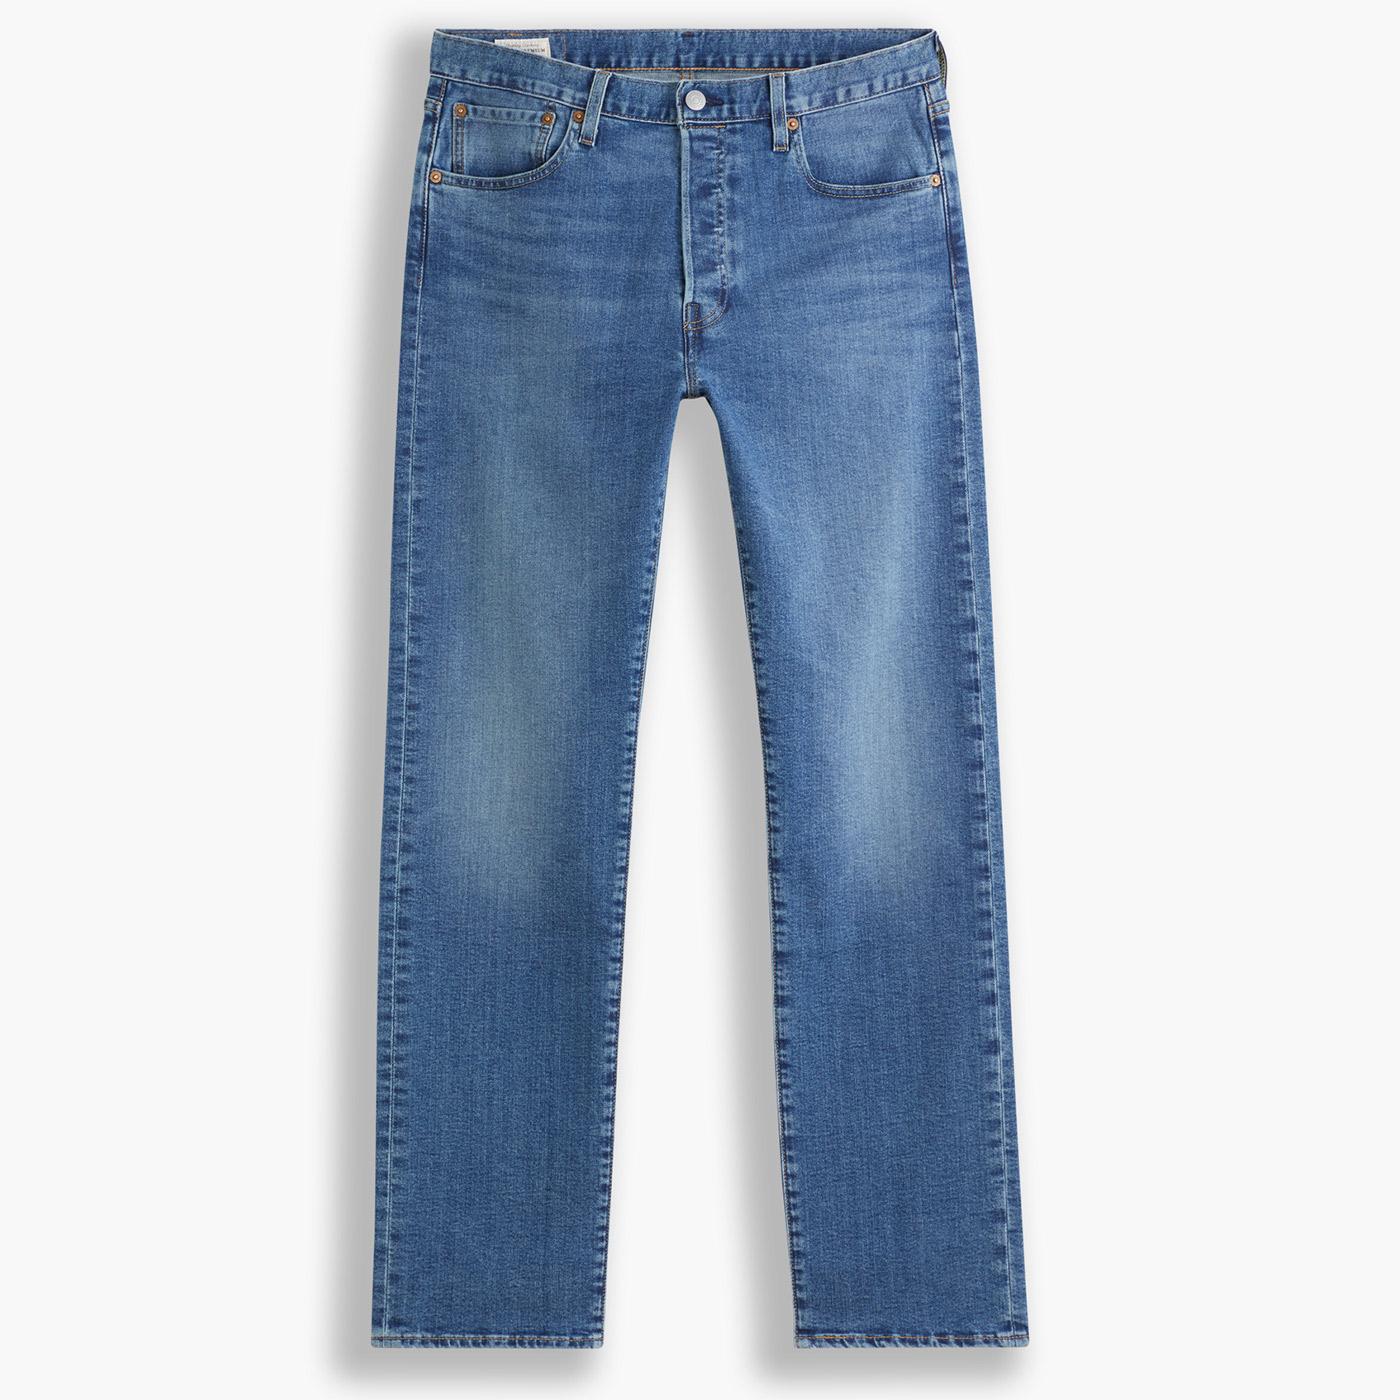 LEVI'S 501 Original Straight Retro Jeans (BIM)